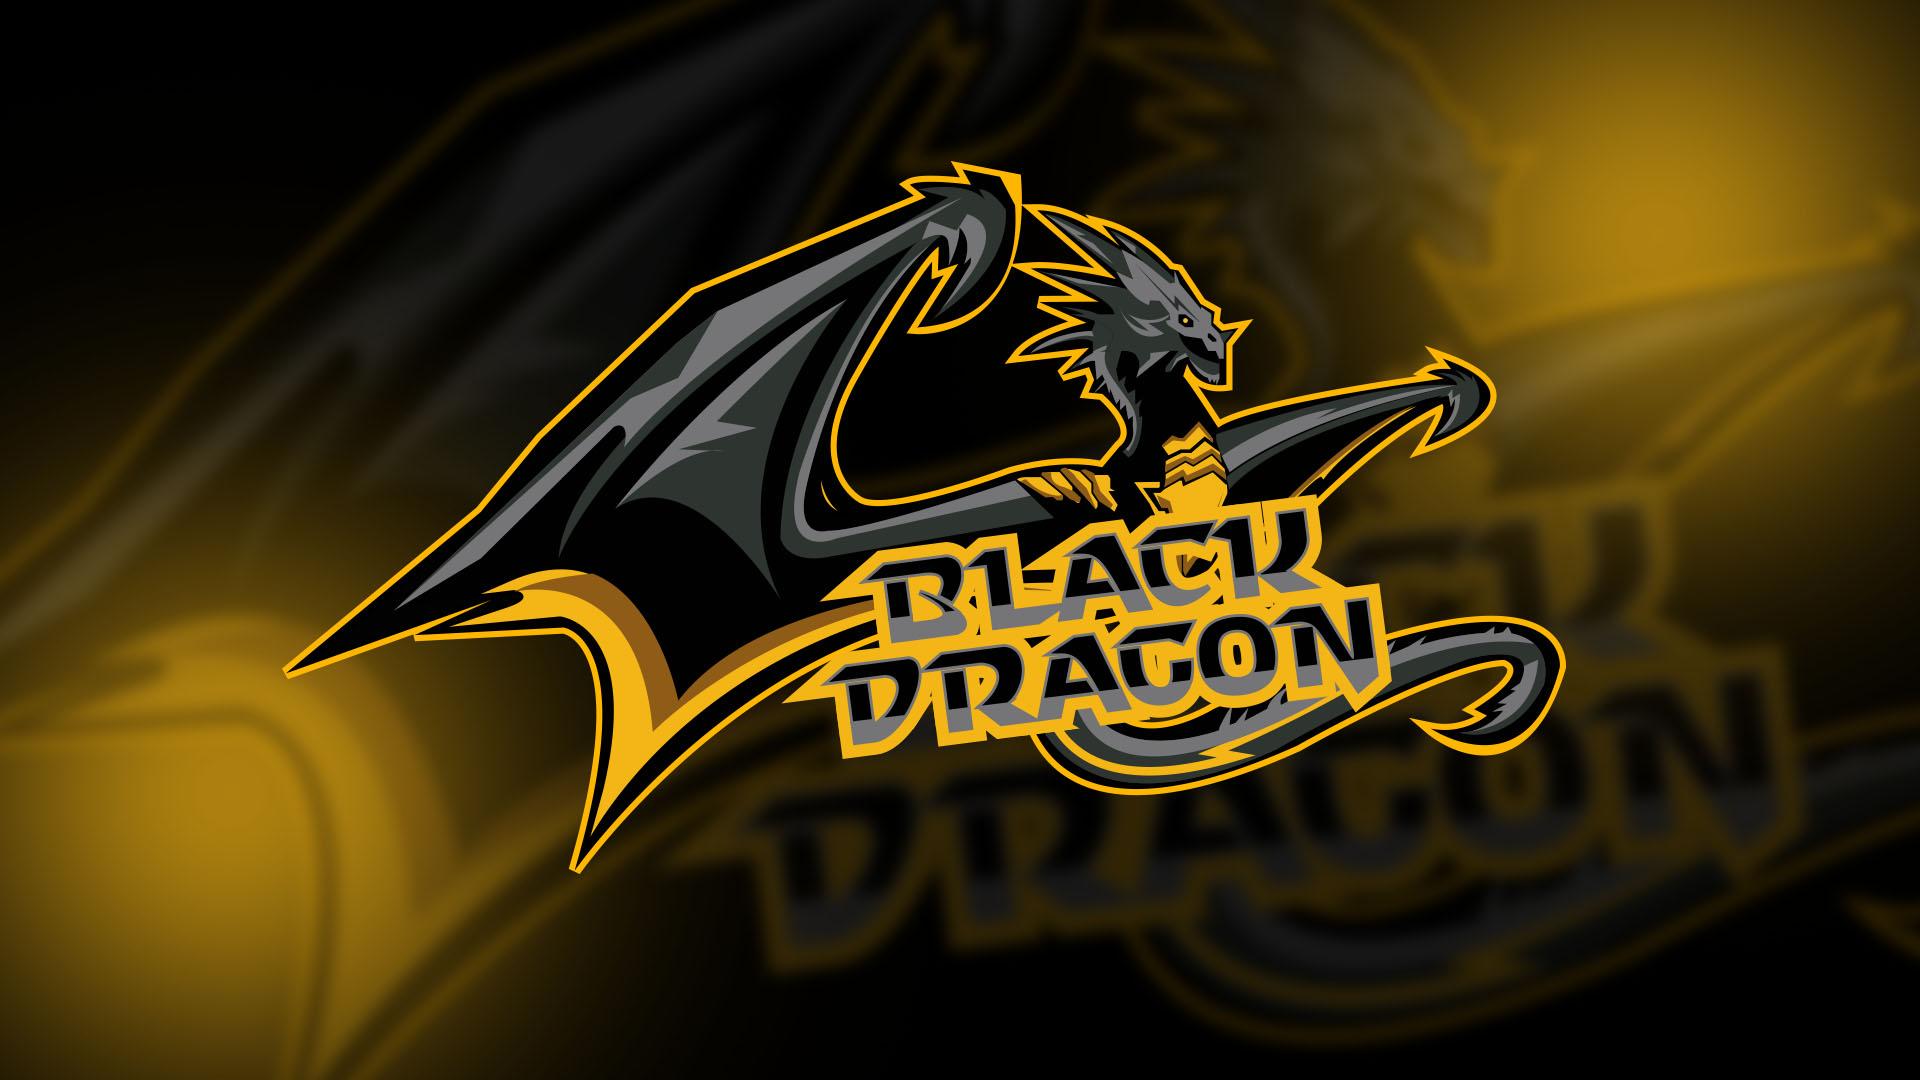 I will design E sports/mascot logos for you